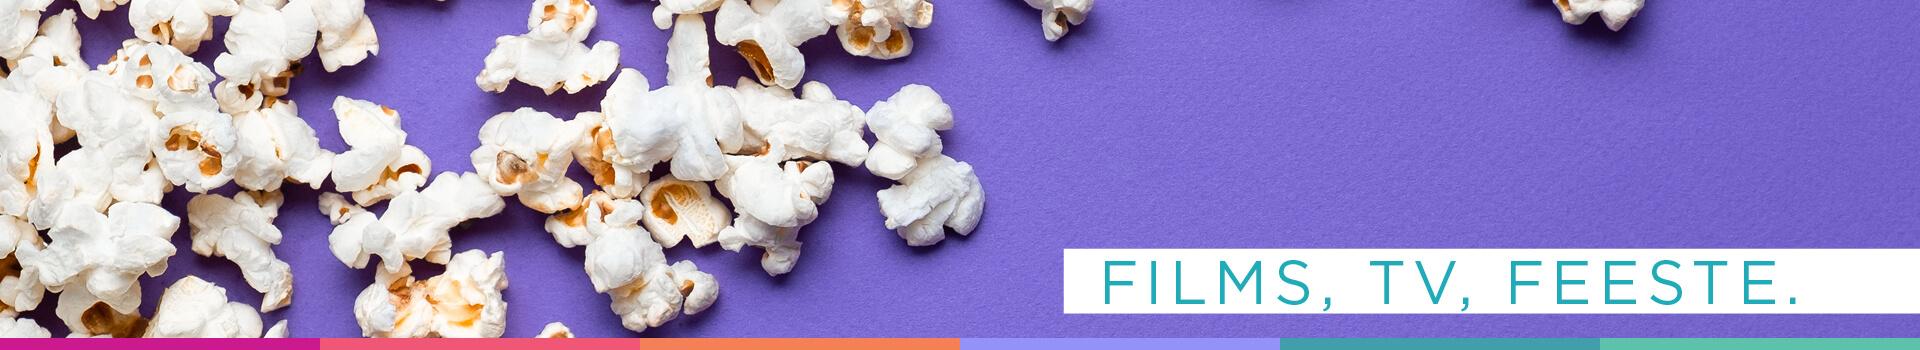 Afrikaans.com Films TV Feeste